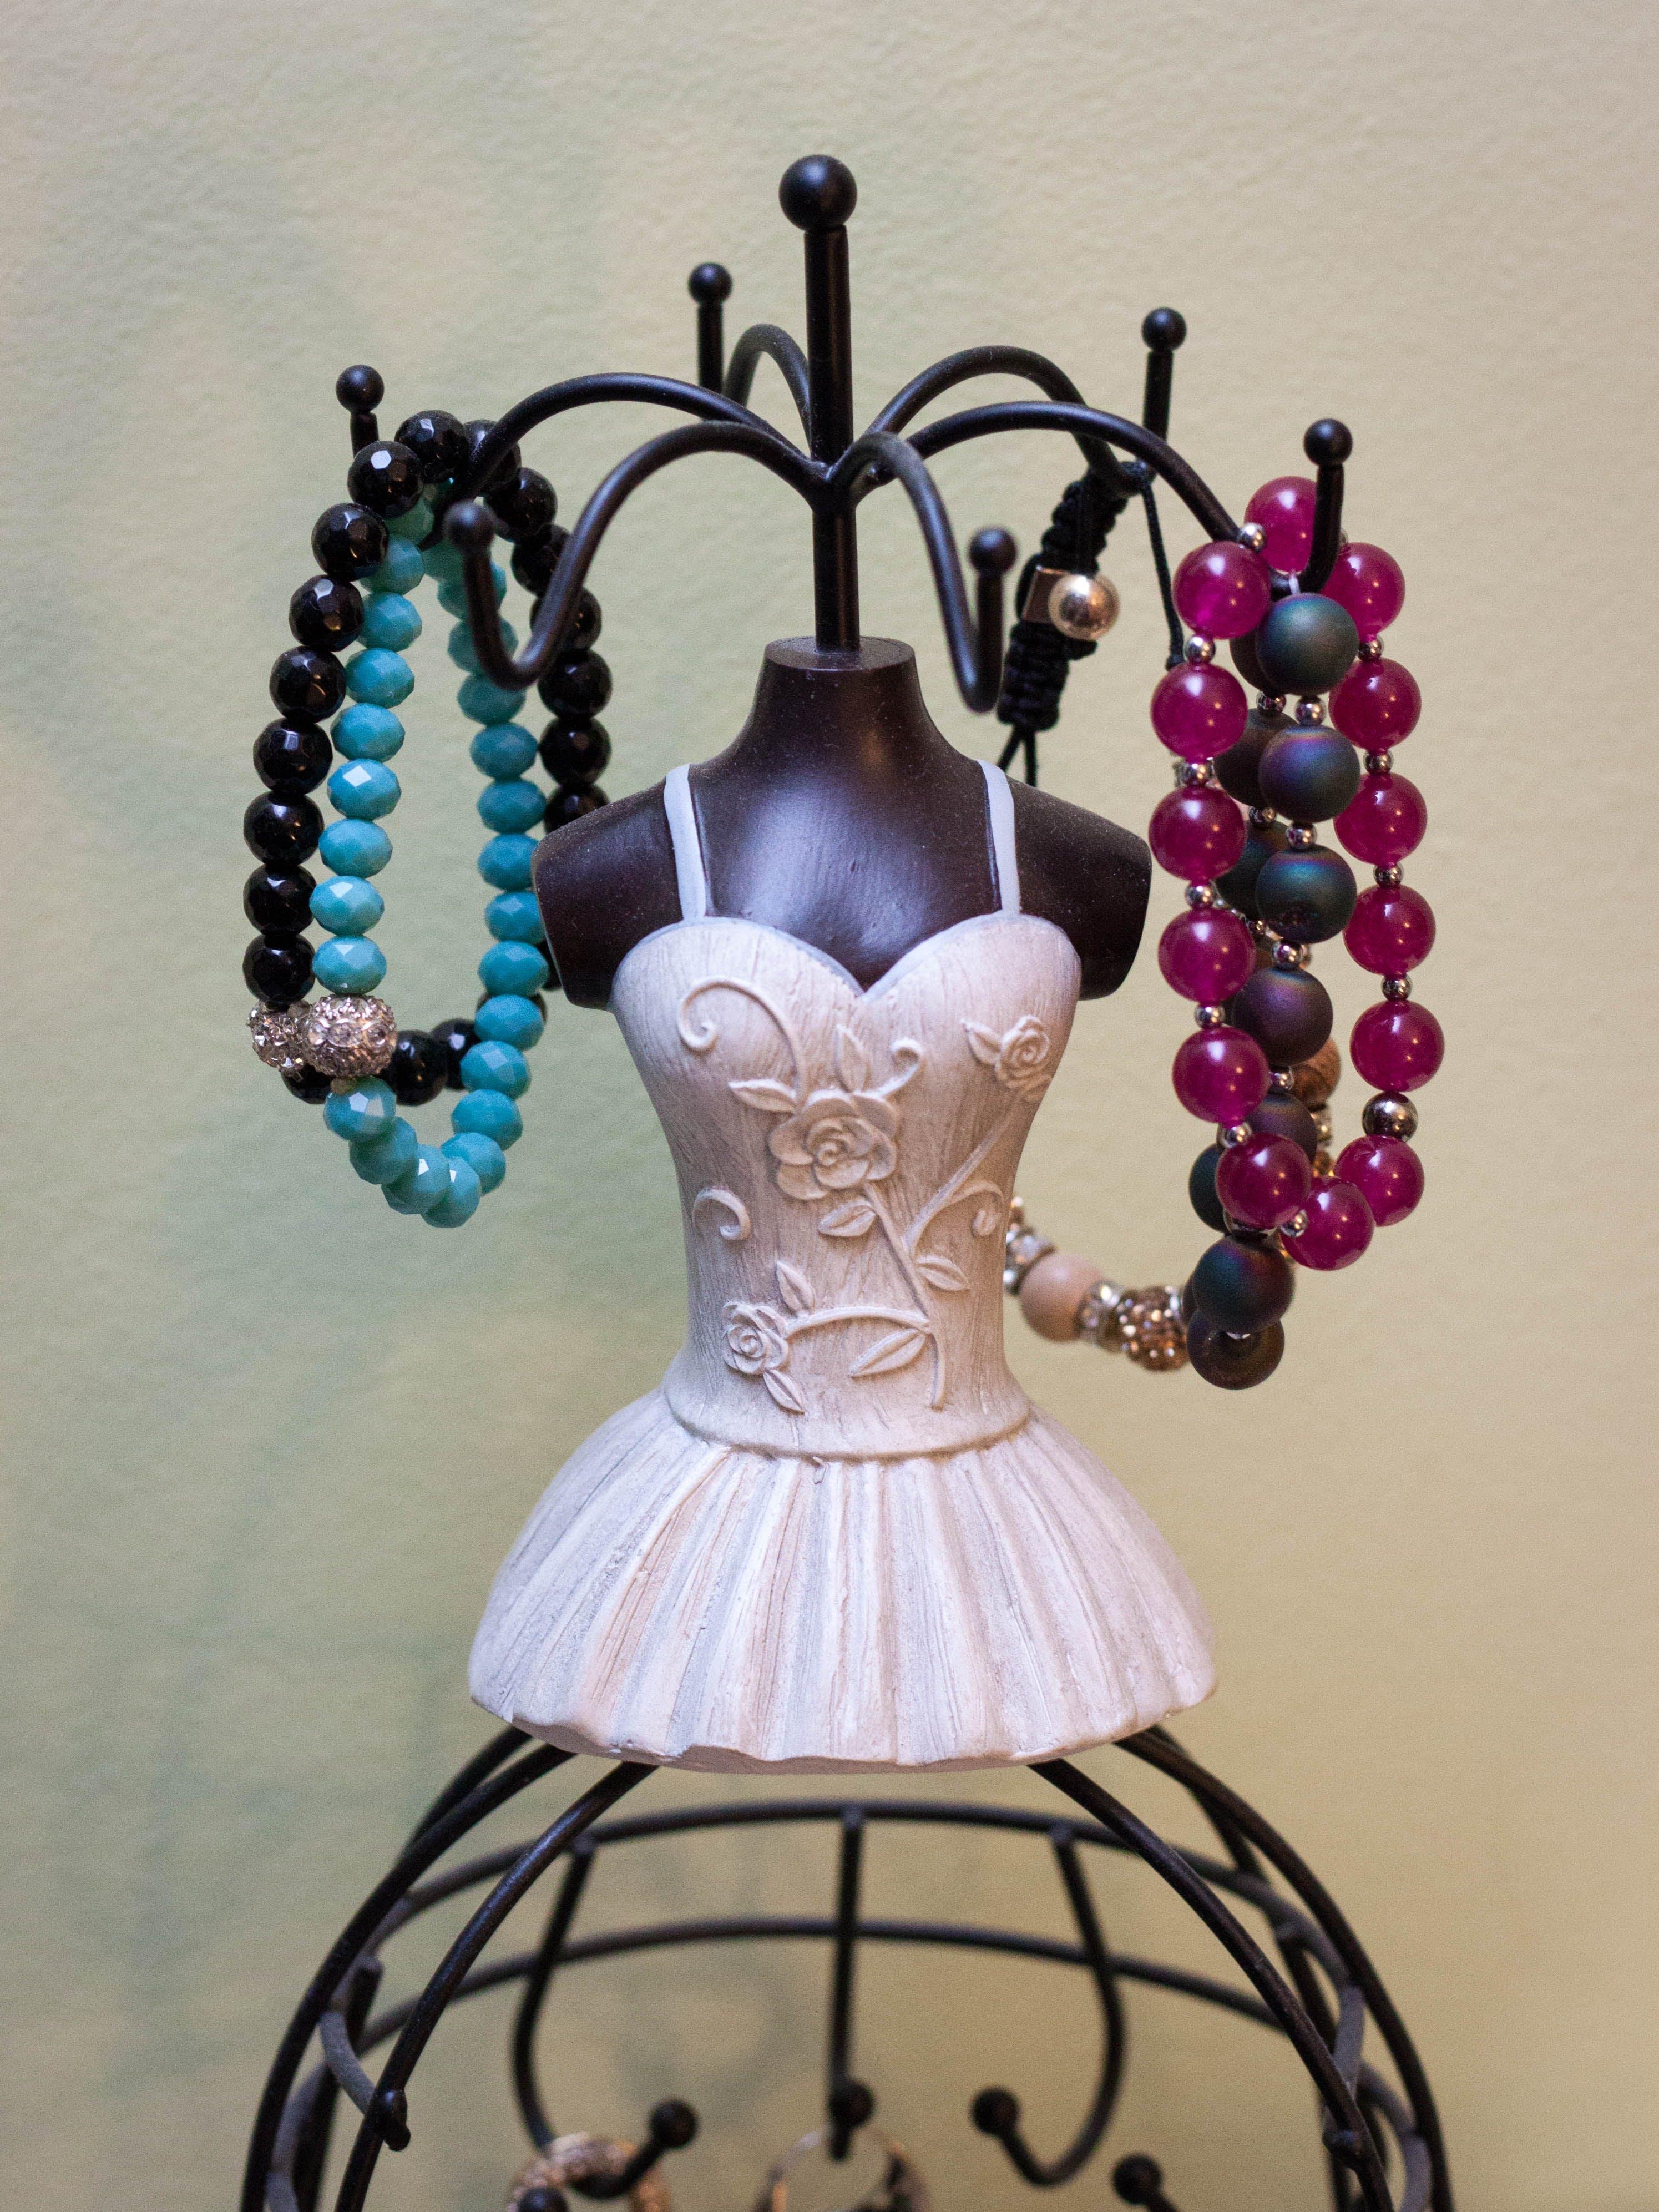 Free stock photo of jewellery, bracelets, dancer